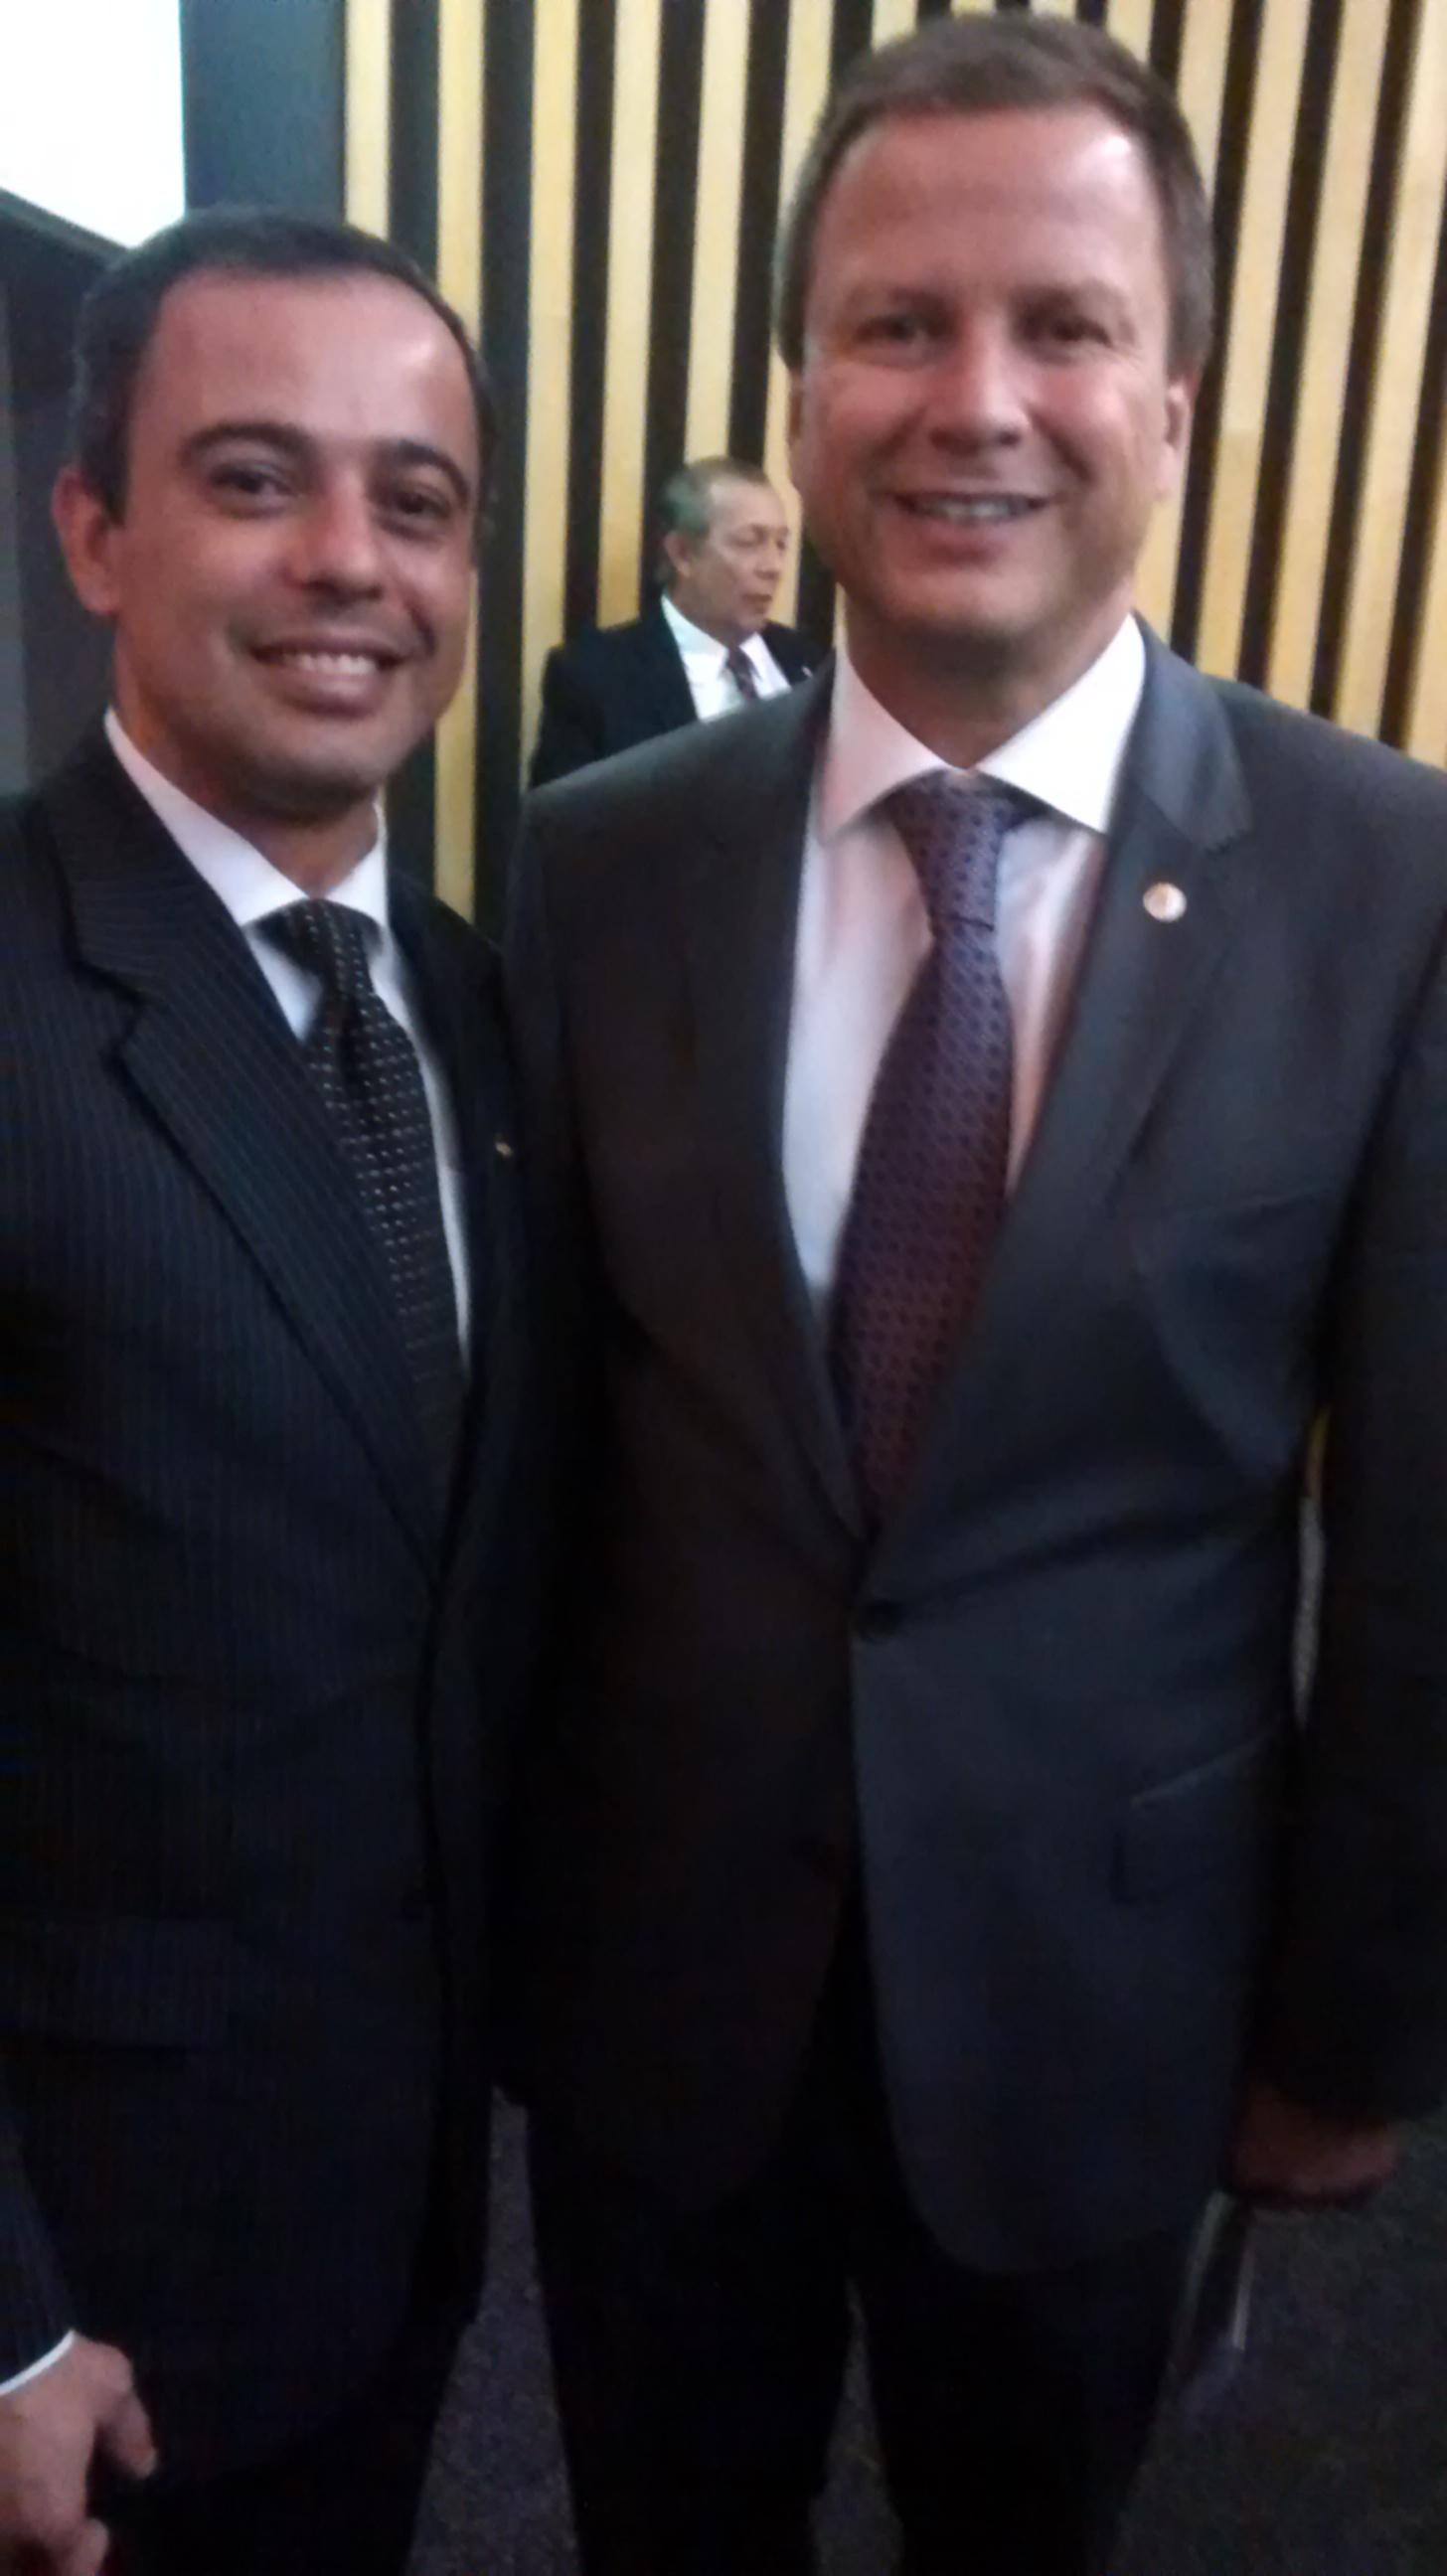 Presidente OAB Nacional ano 2016/2018